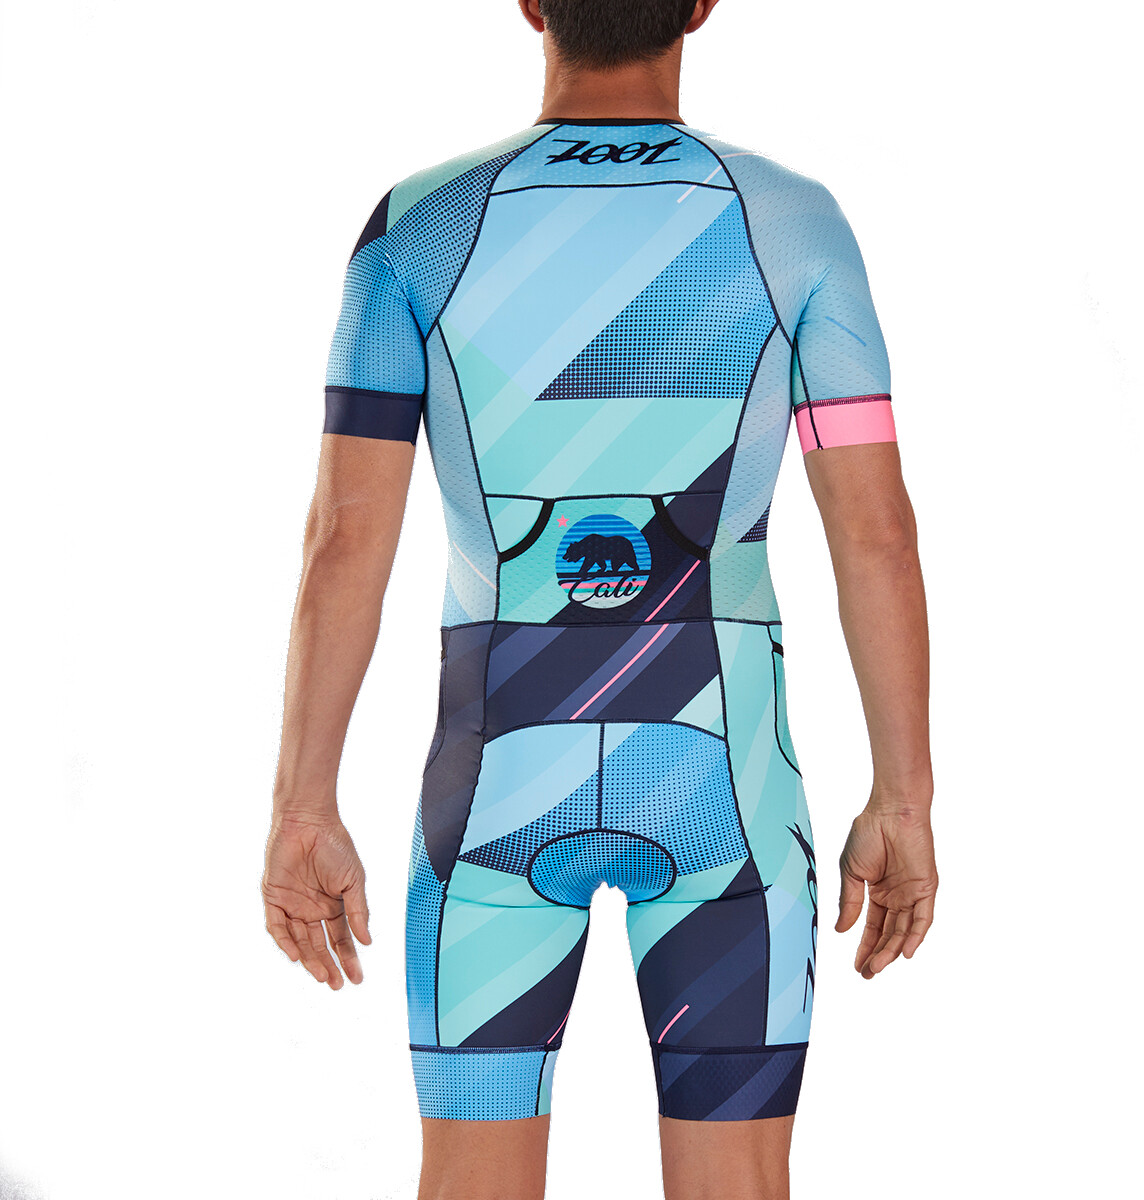 bae11852 Zoot LTD Tri Aero SS Racesuit Men cali | Gode tilbud hos bikester.no